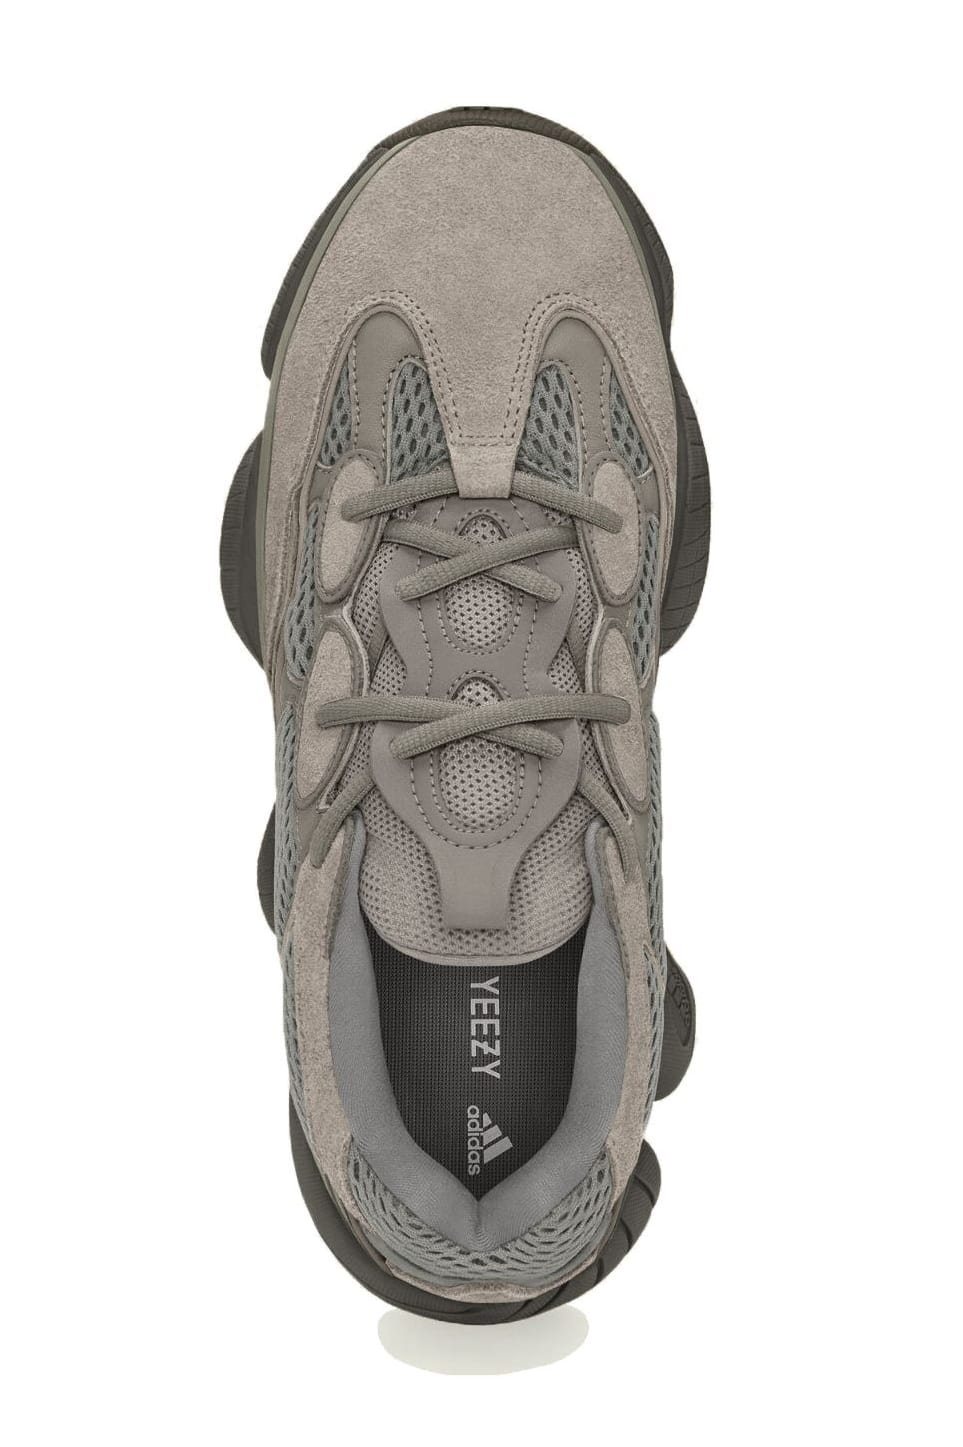 Adidas Yeezy 500 'Ash Grey' Top